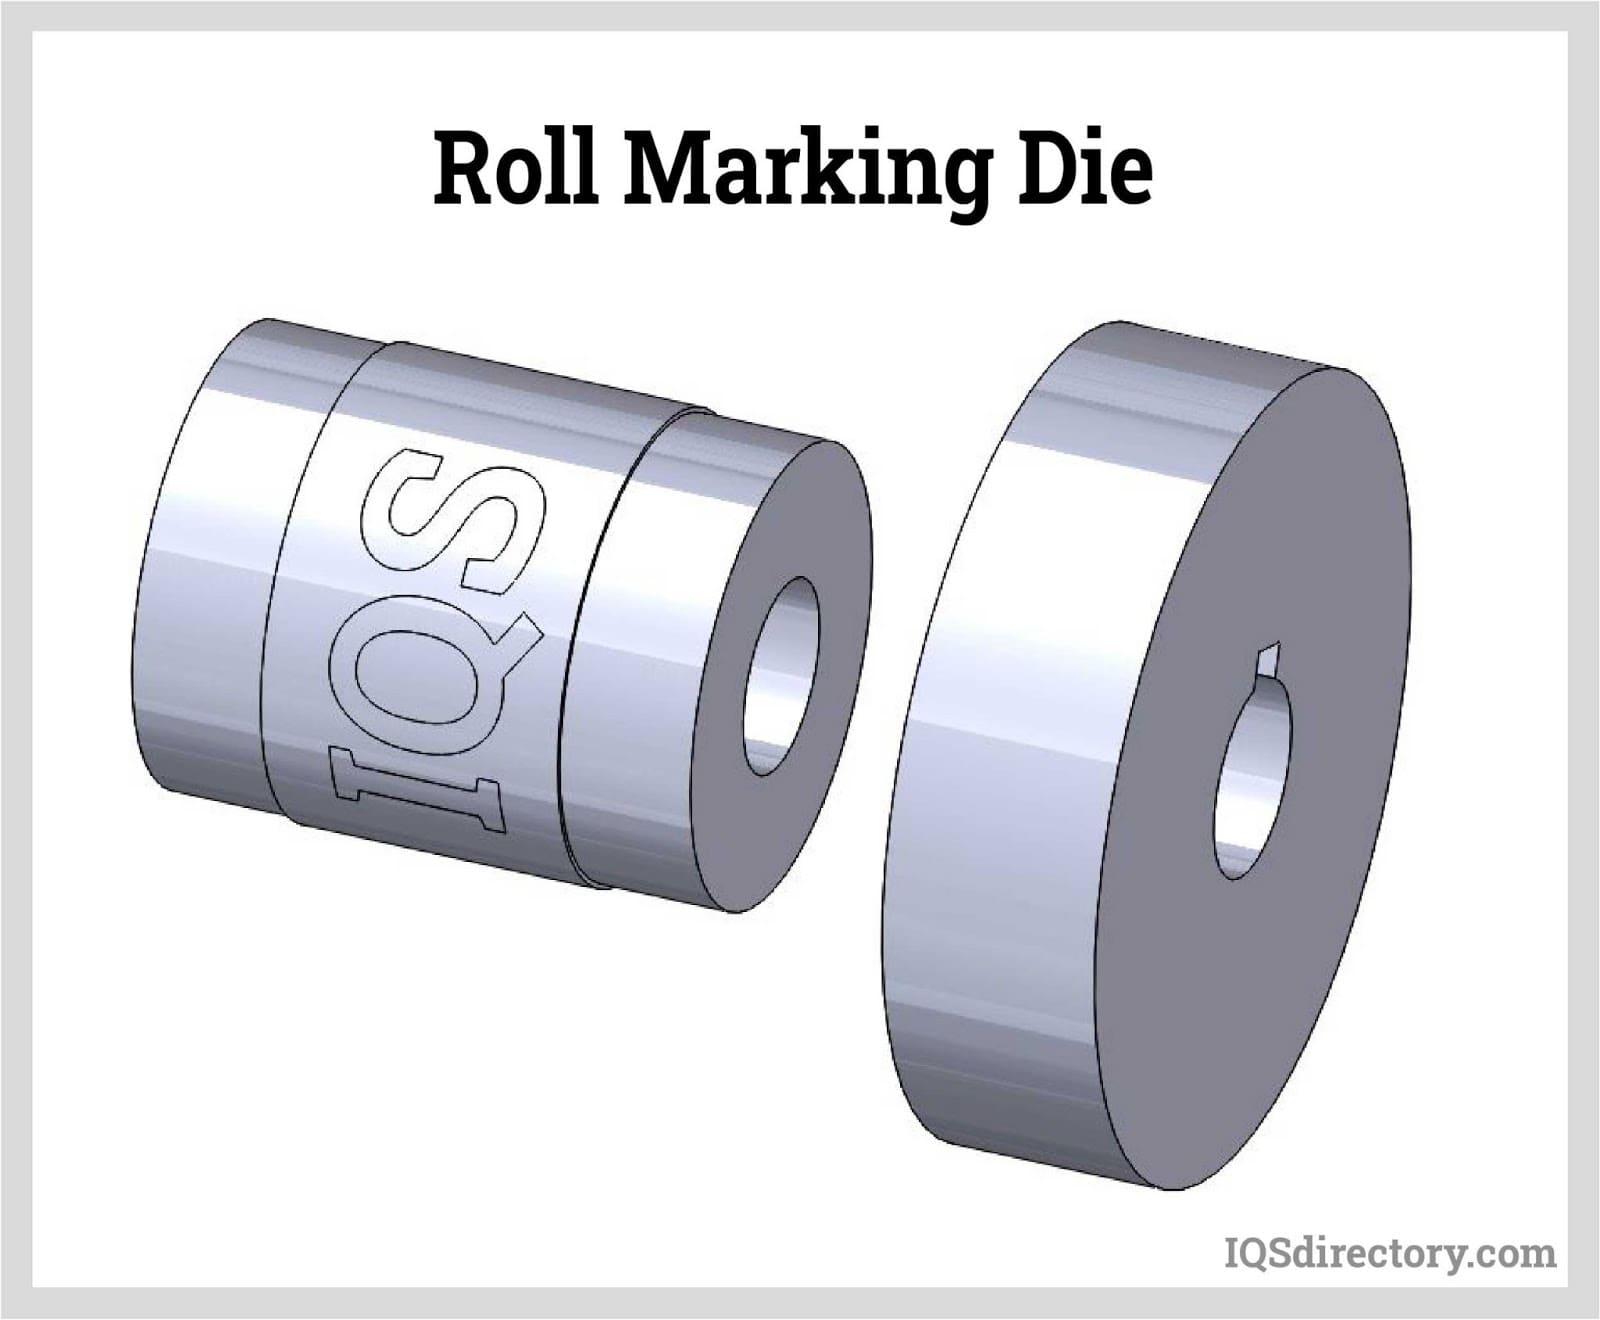 Roll Marking Die